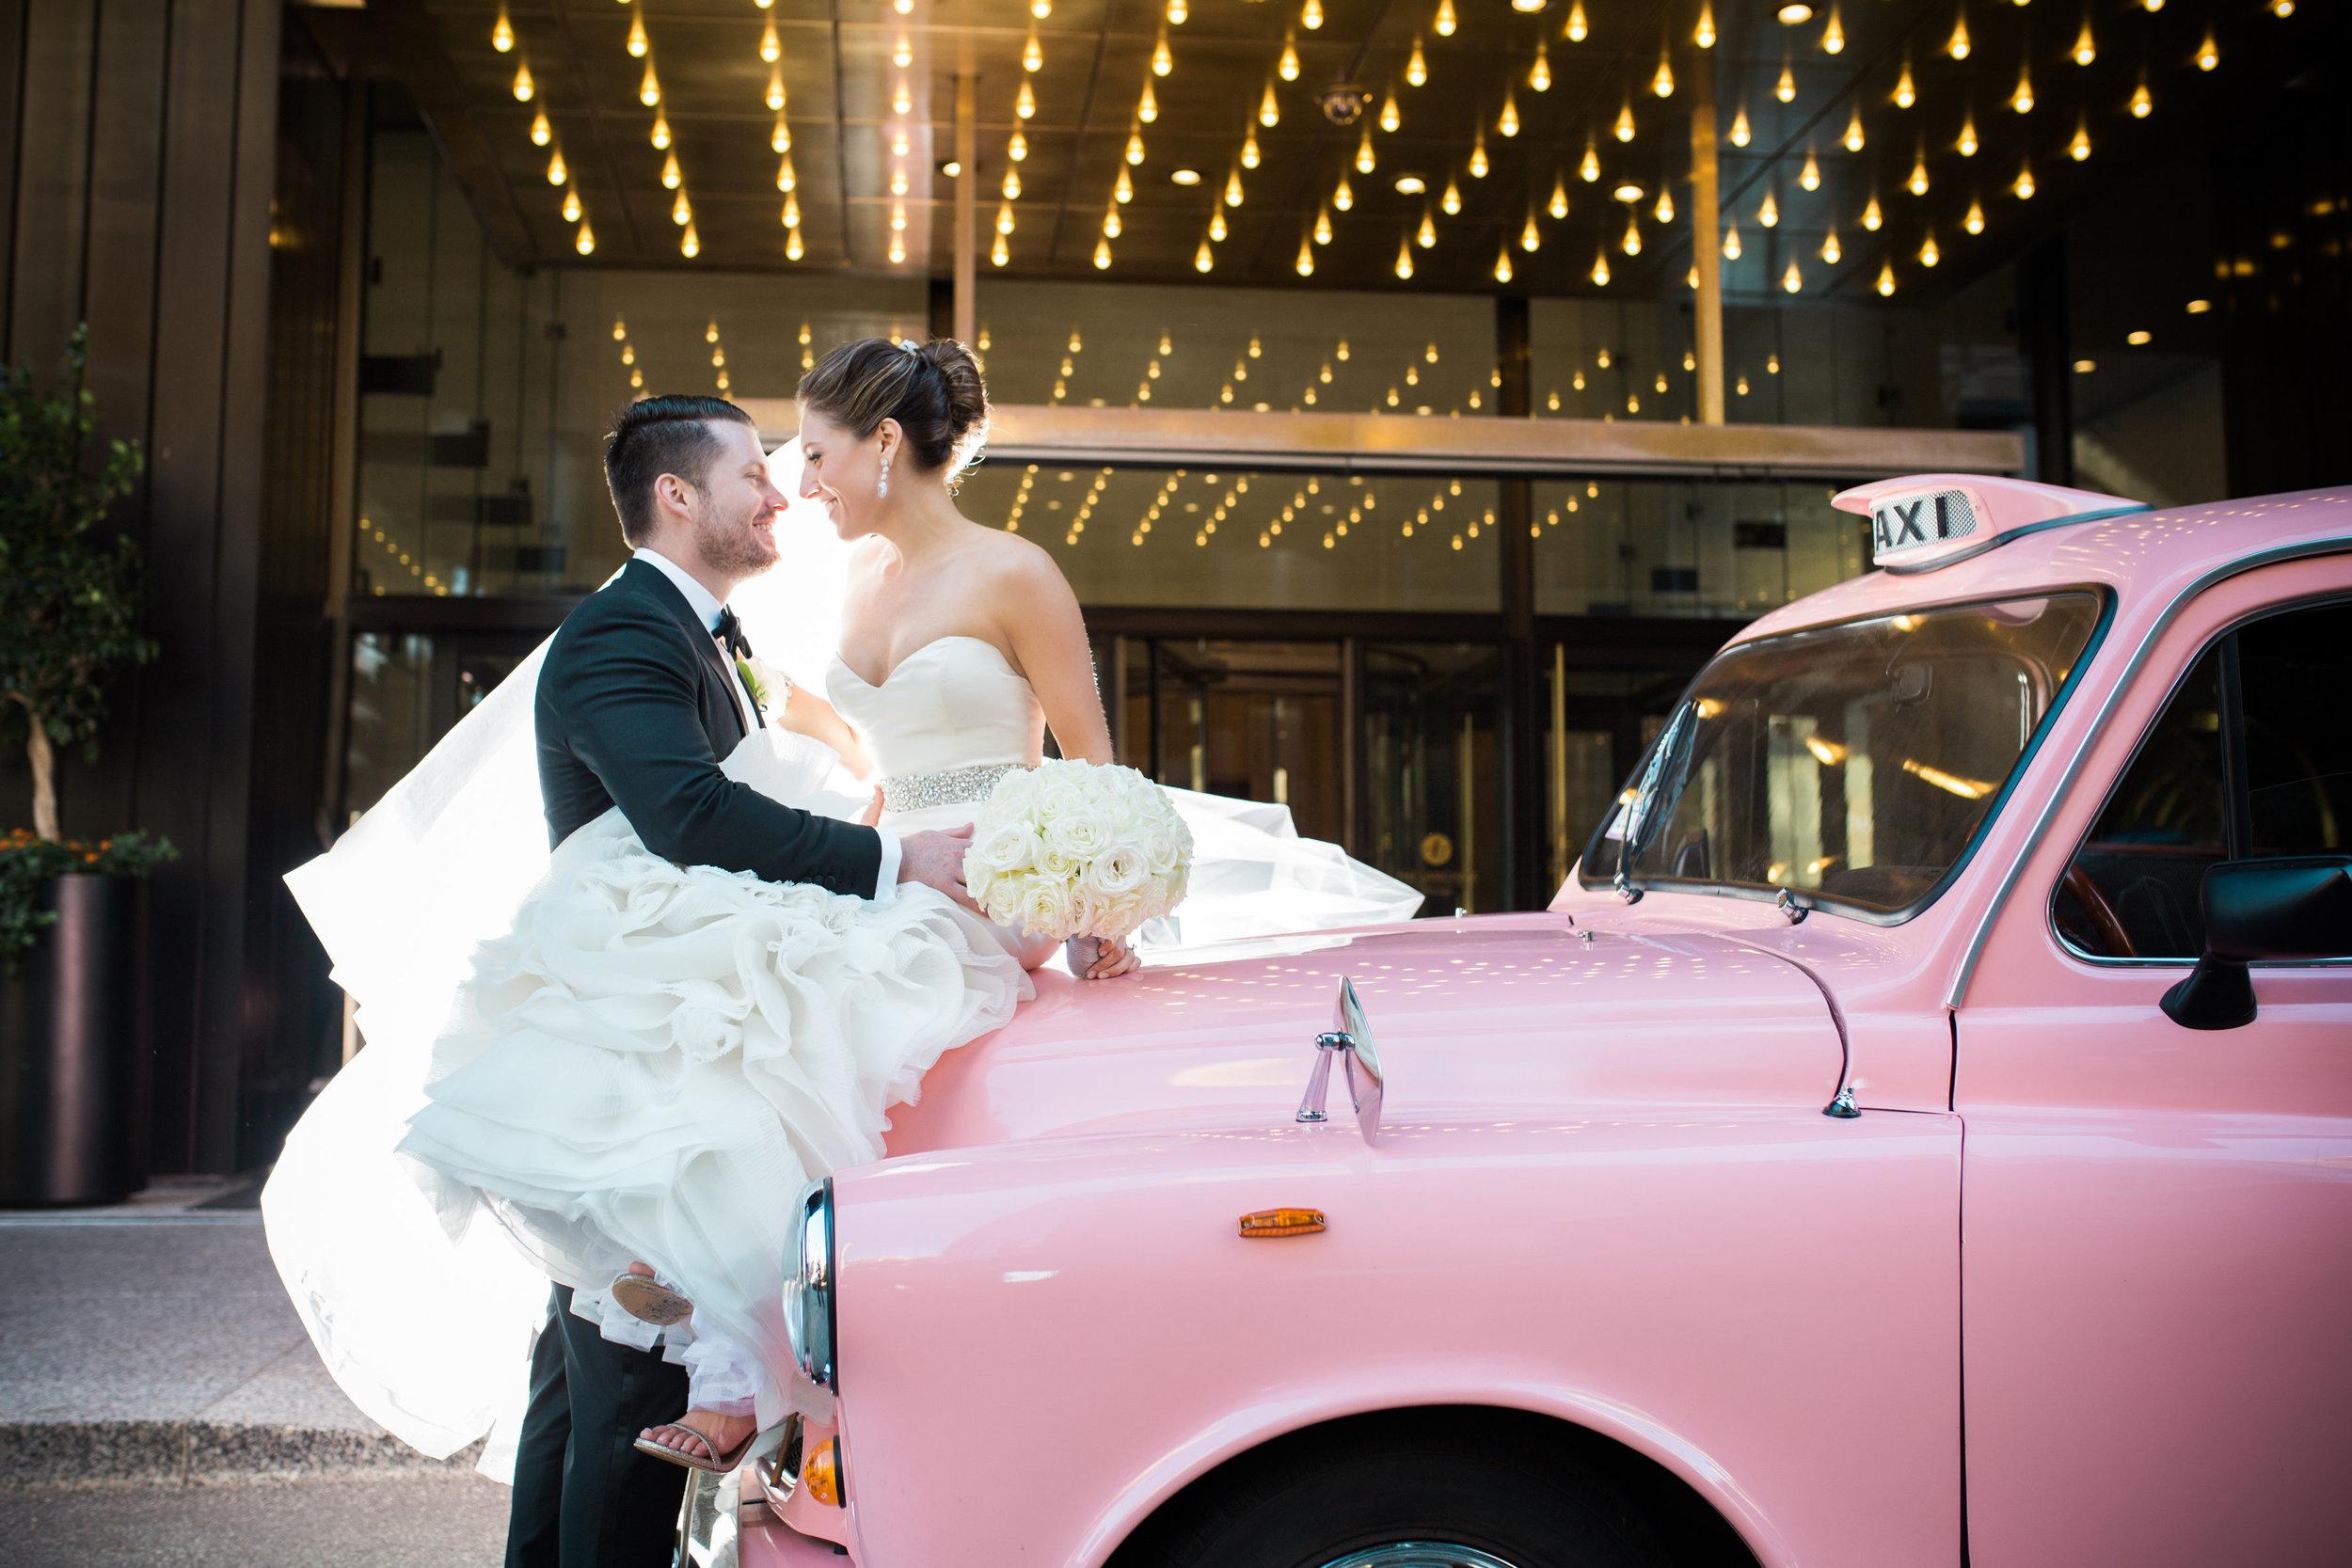 Wedding Photos at the Langham Hotel.jpg